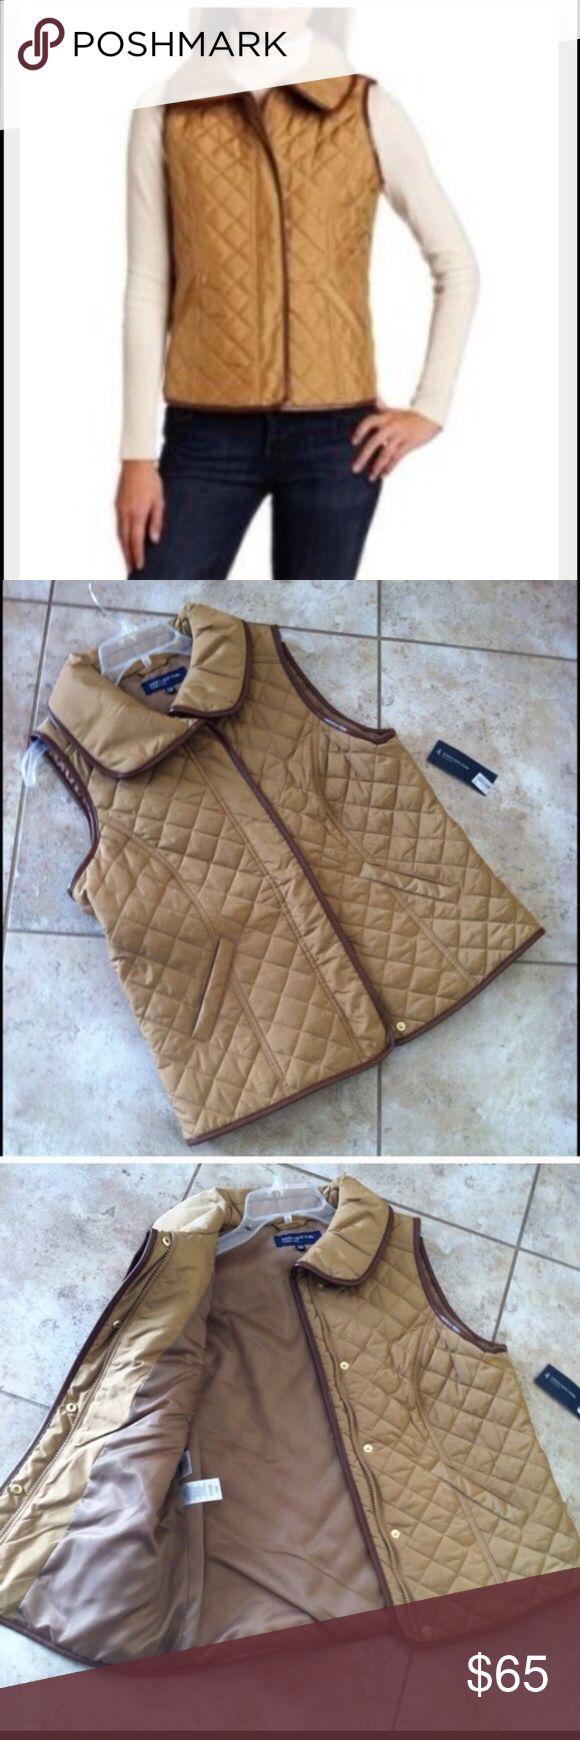 Vest Quilted vest camel color snaps and zipper Jackets & Coats Vests